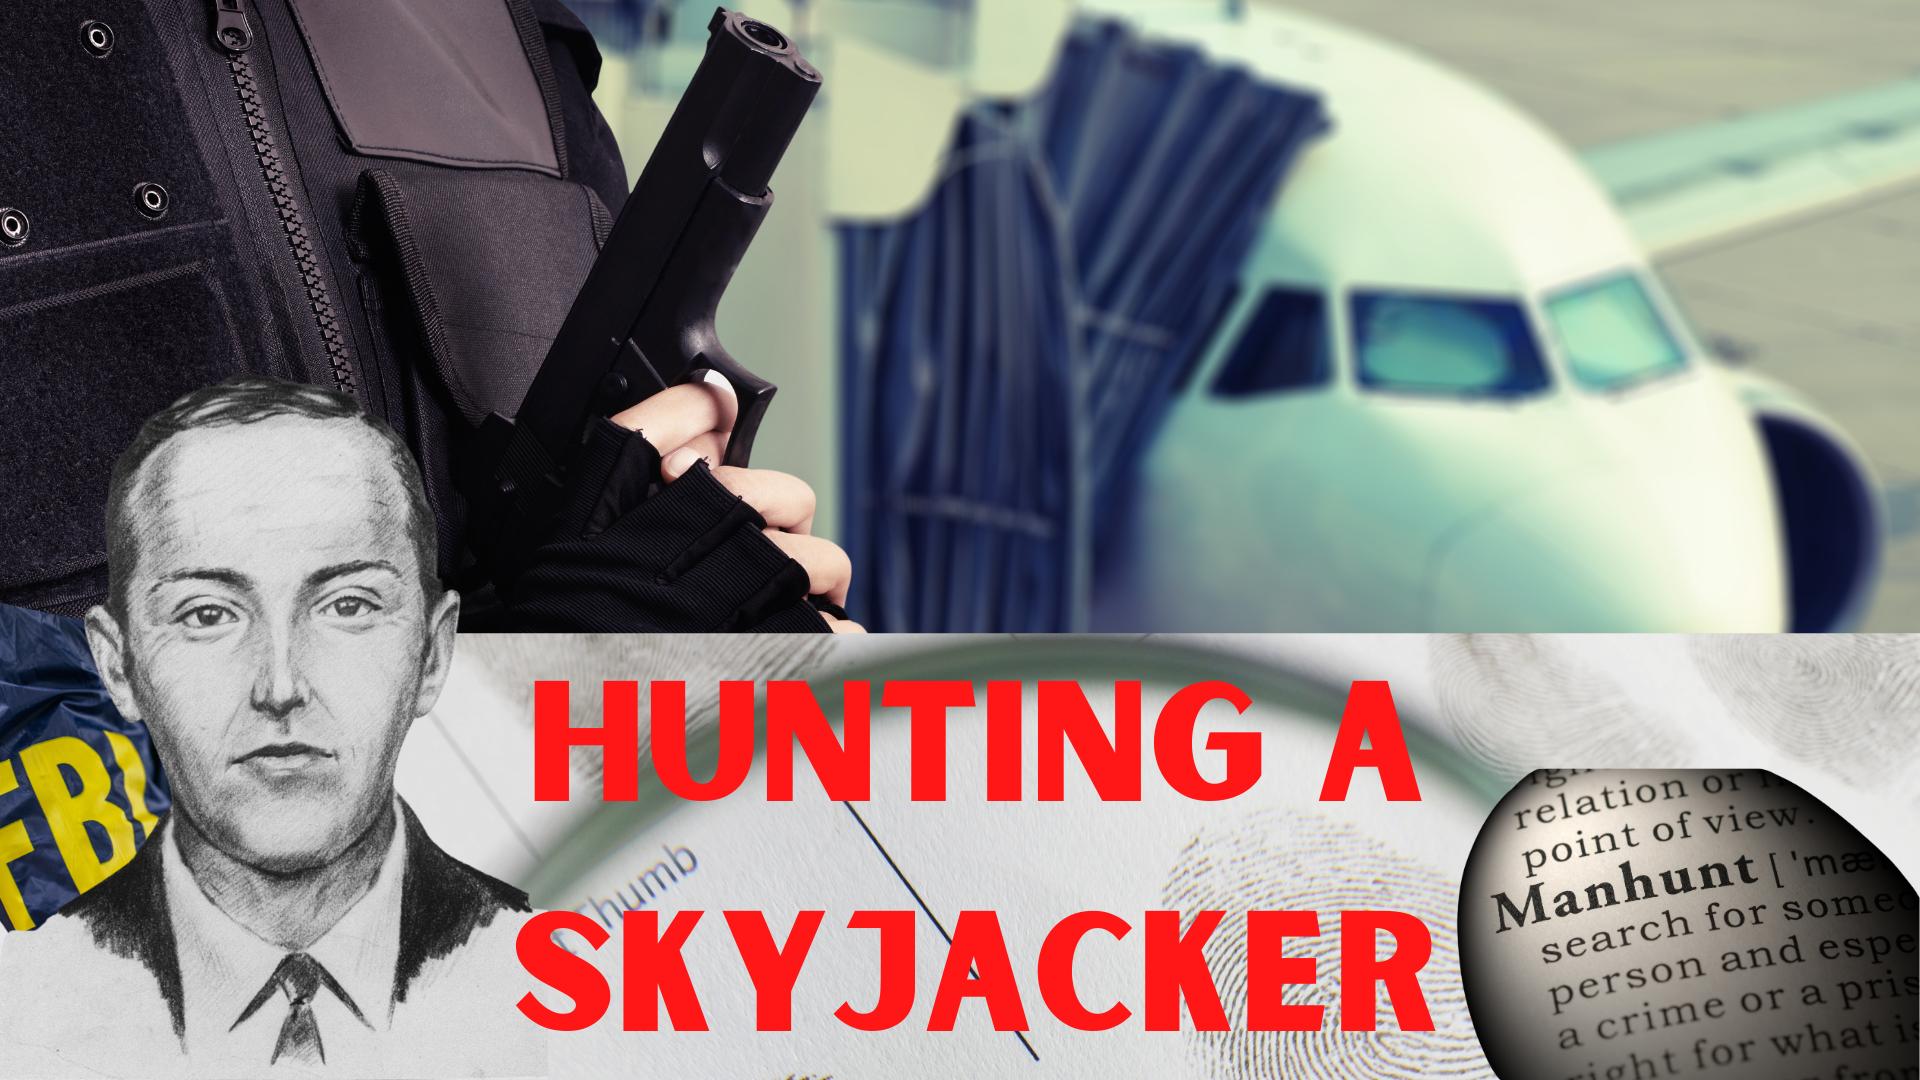 Thumbnail for Ep. #421: Hunting A Skyjacker w/ Eric Ulis